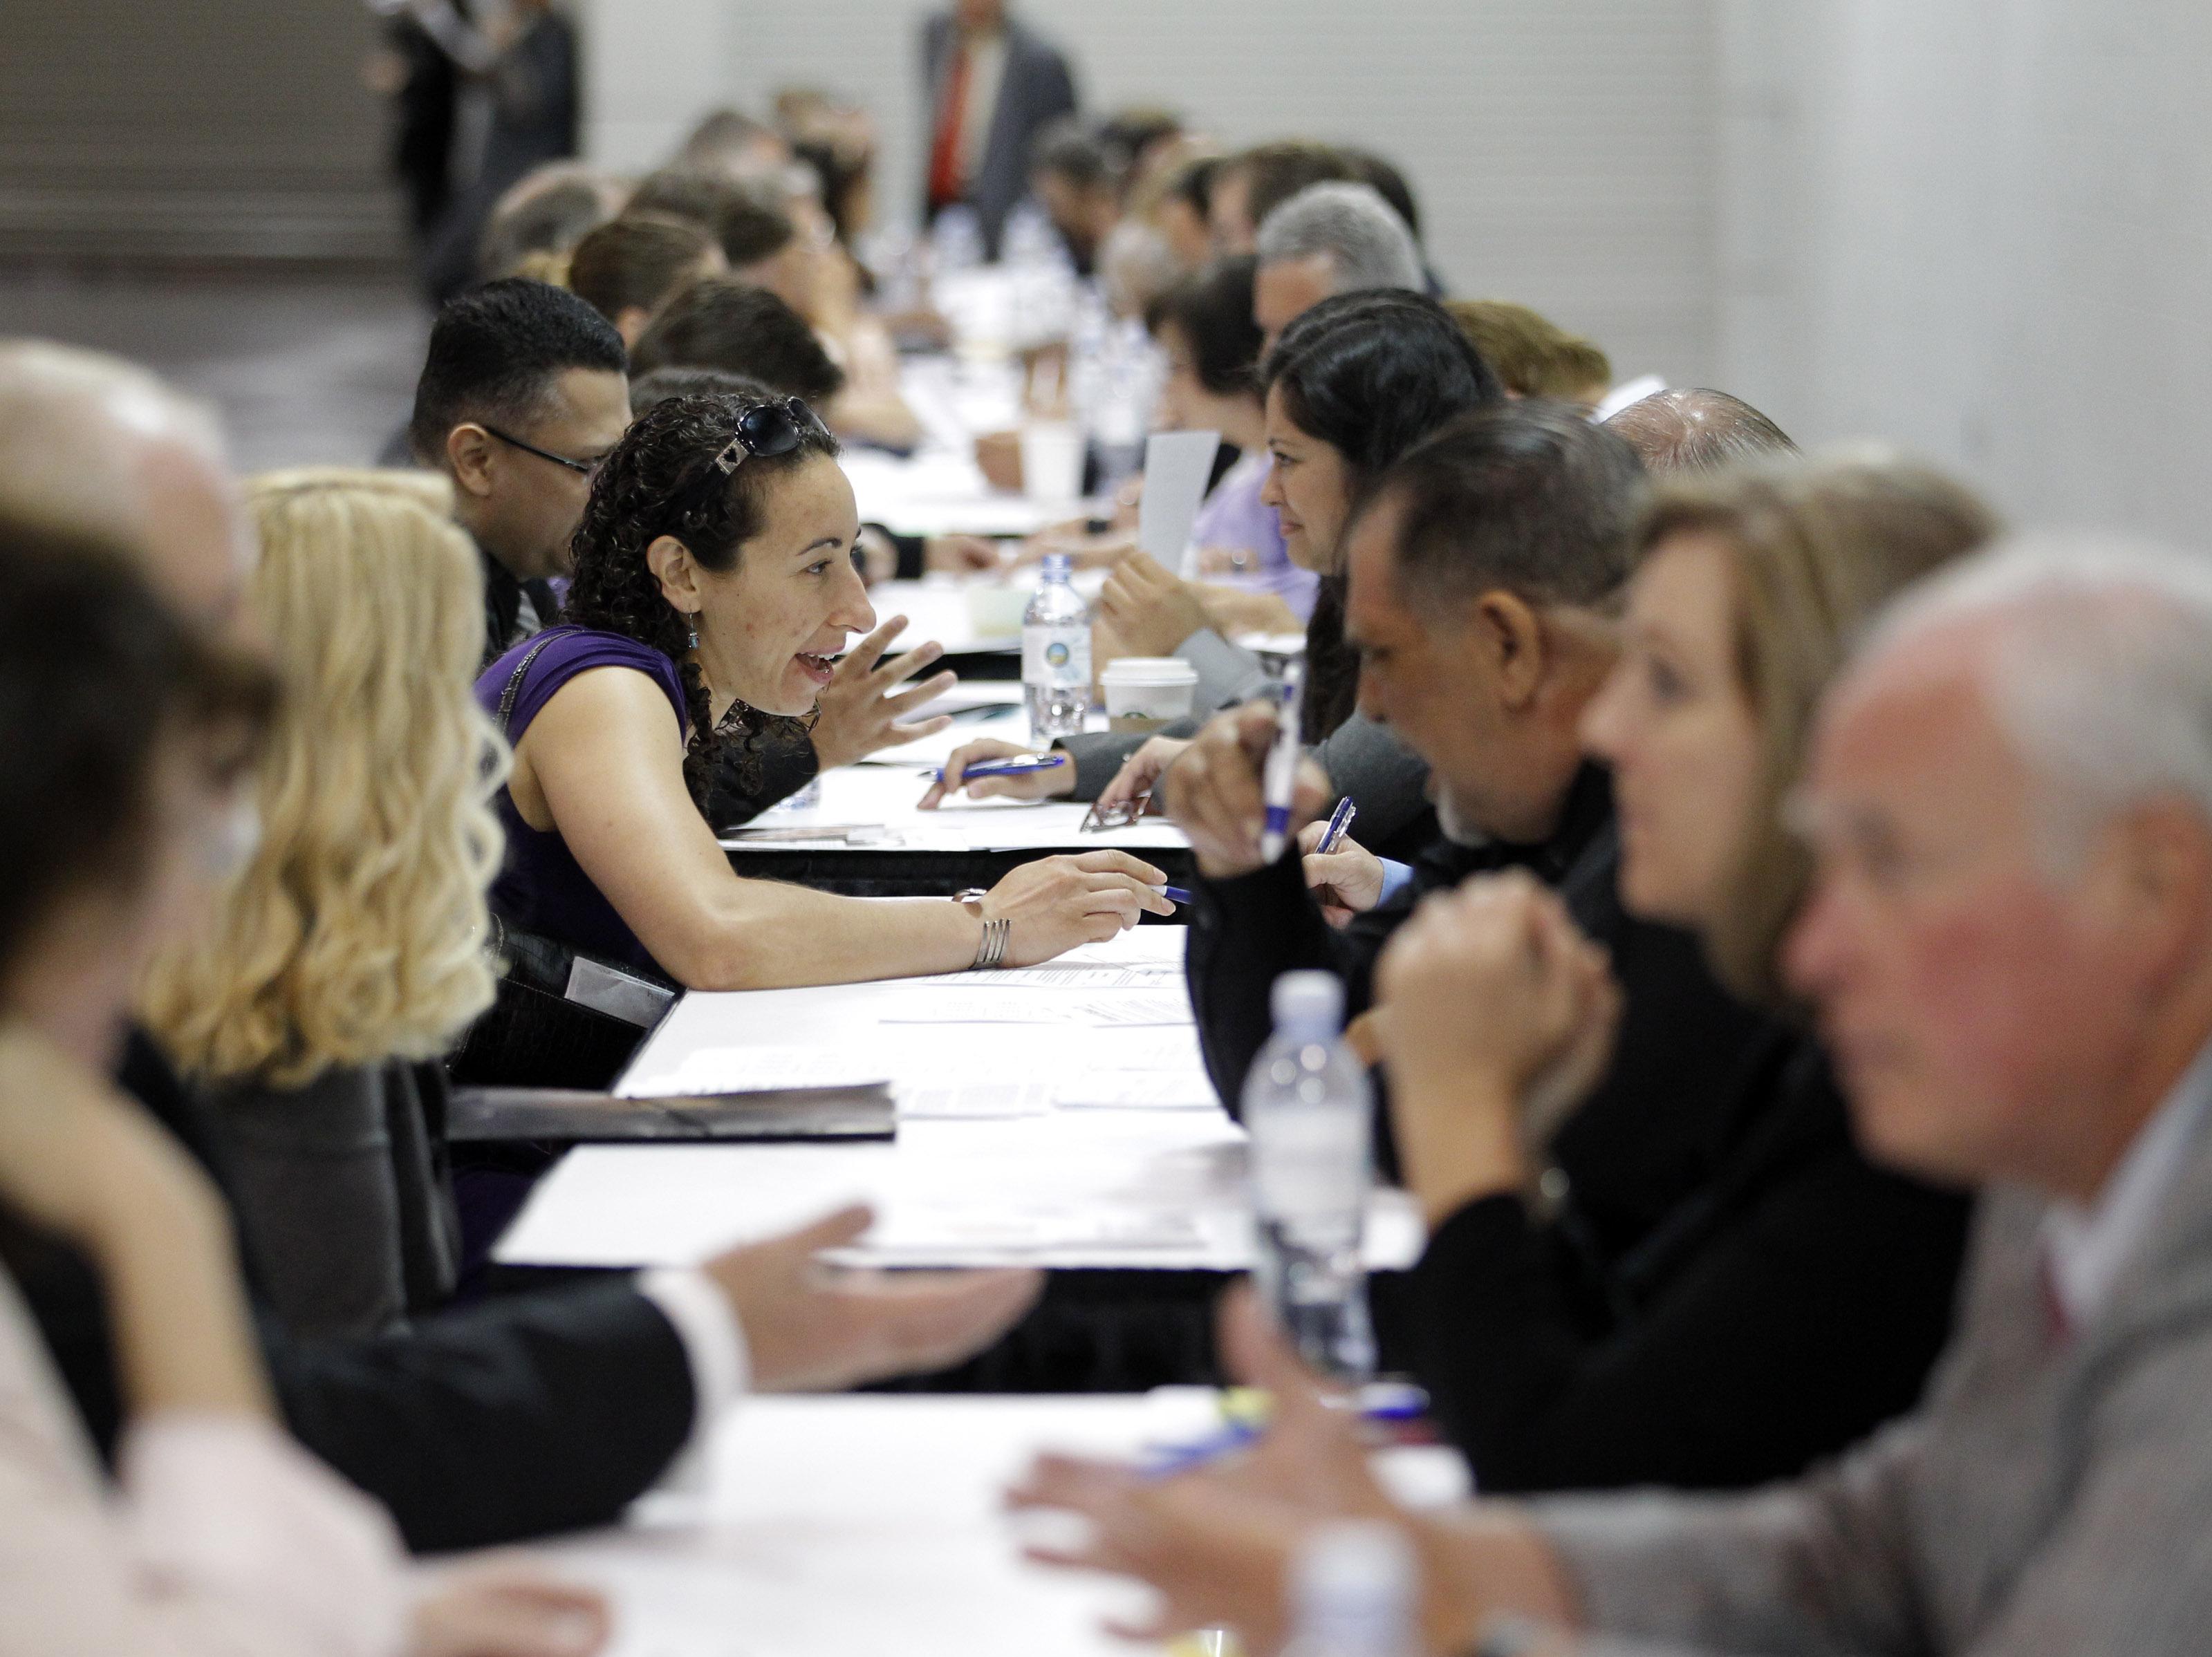 December Posts Strongest Job Gains Of 2013, Survey Shows